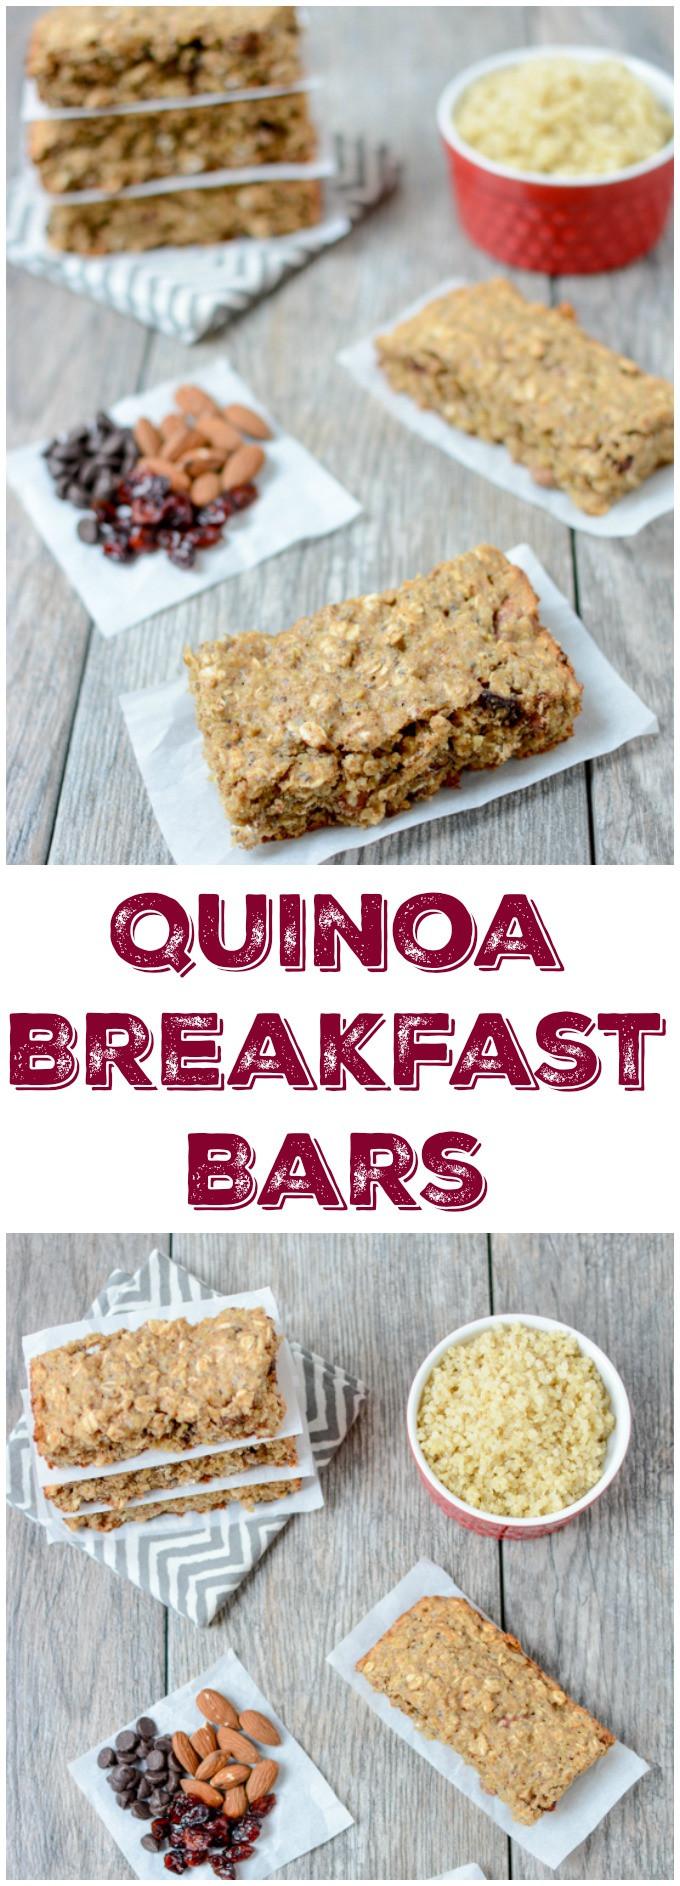 Healthy On The Go Breakfast Bars  Quinoa Breakfast Bars